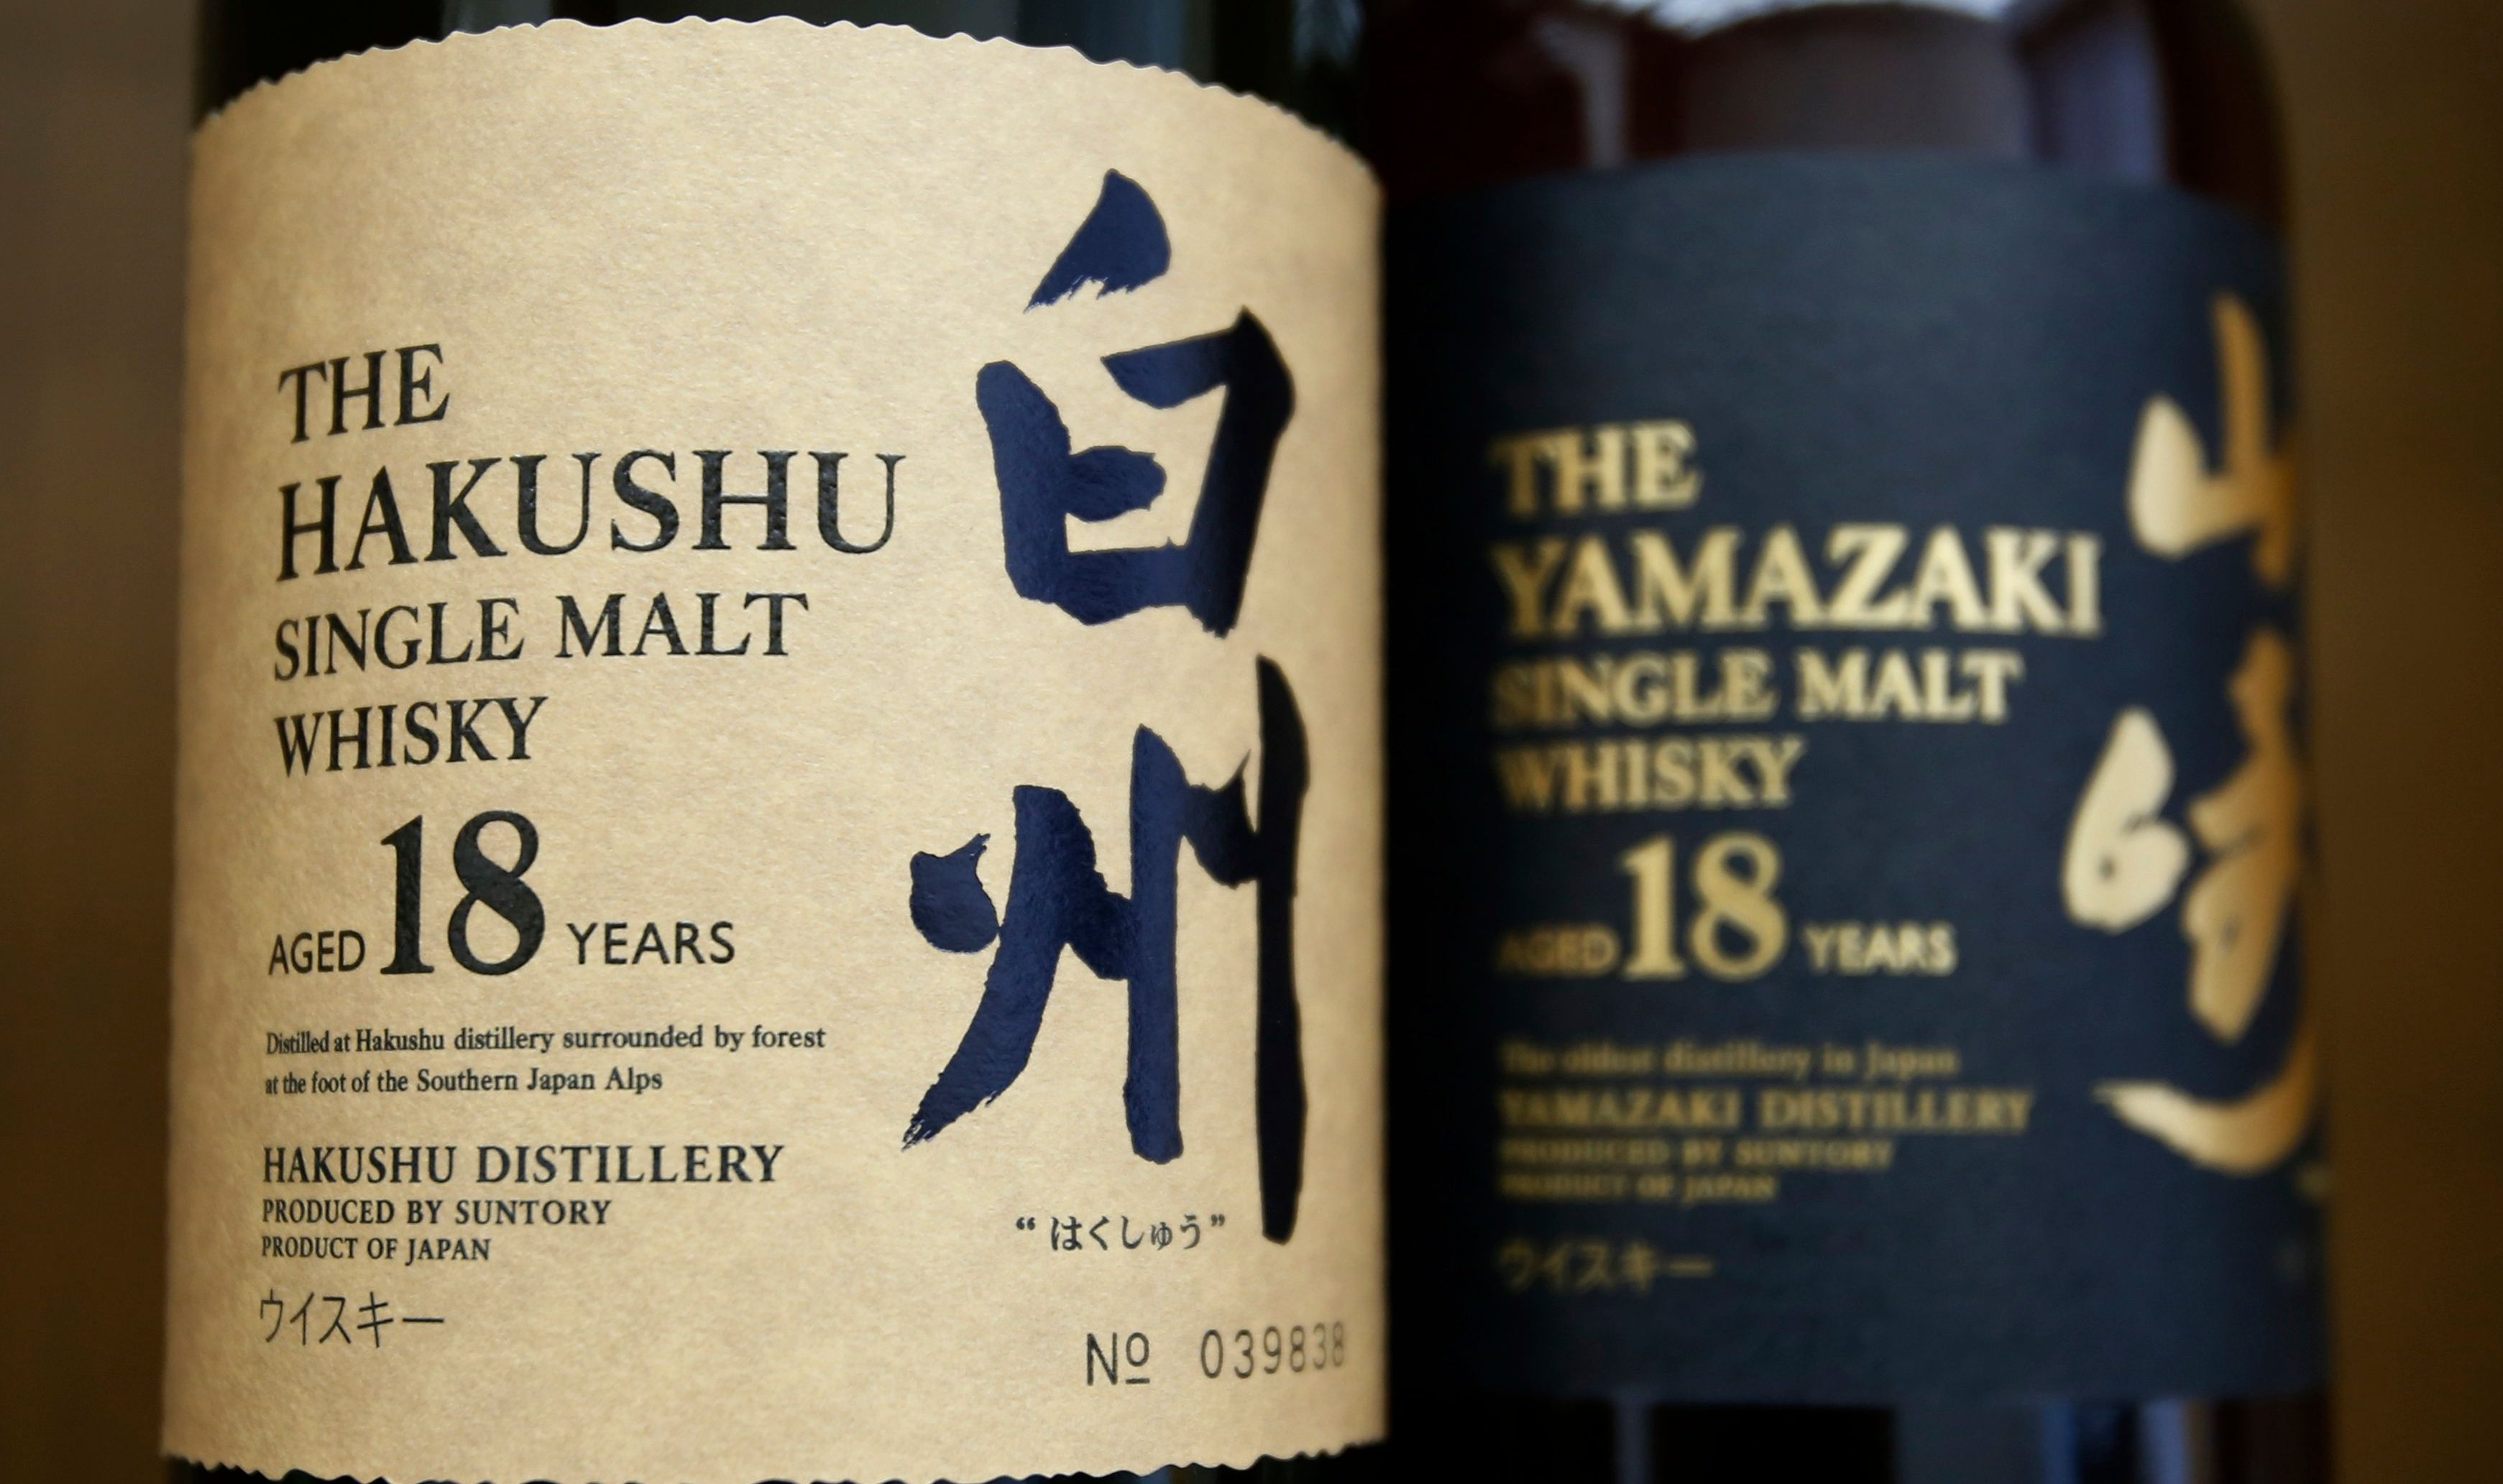 Bottles of Suntory Holding's Yamazaki and Hakushu whiskeies are displayed at Suntory World Headquarters in Tokyo